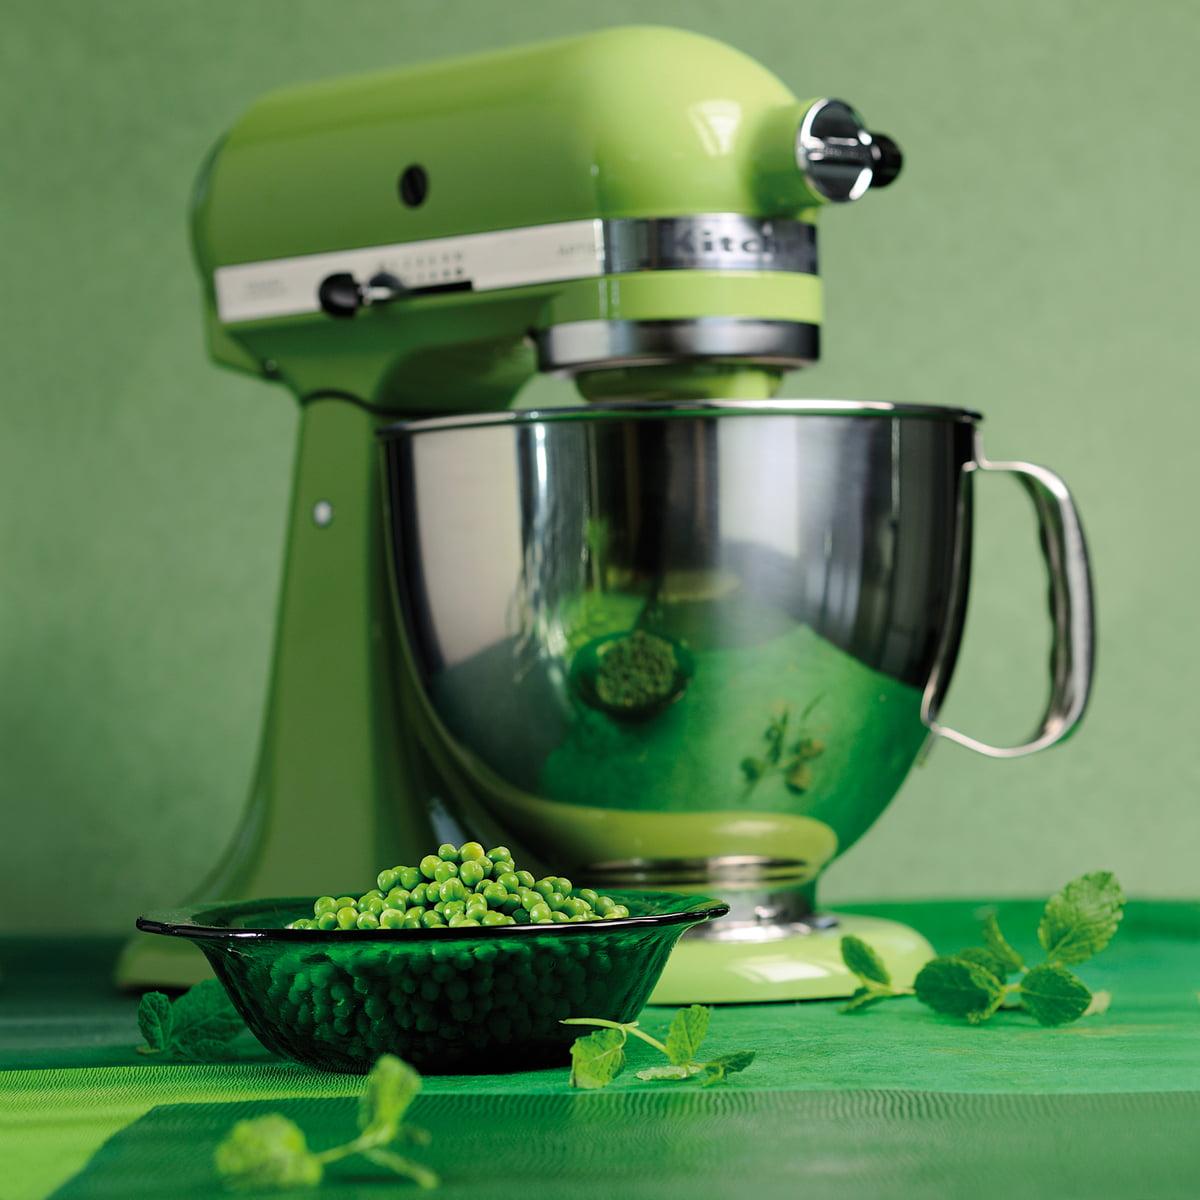 Artisan køkkenmaskine, 4,8 l, fra KitchenAid